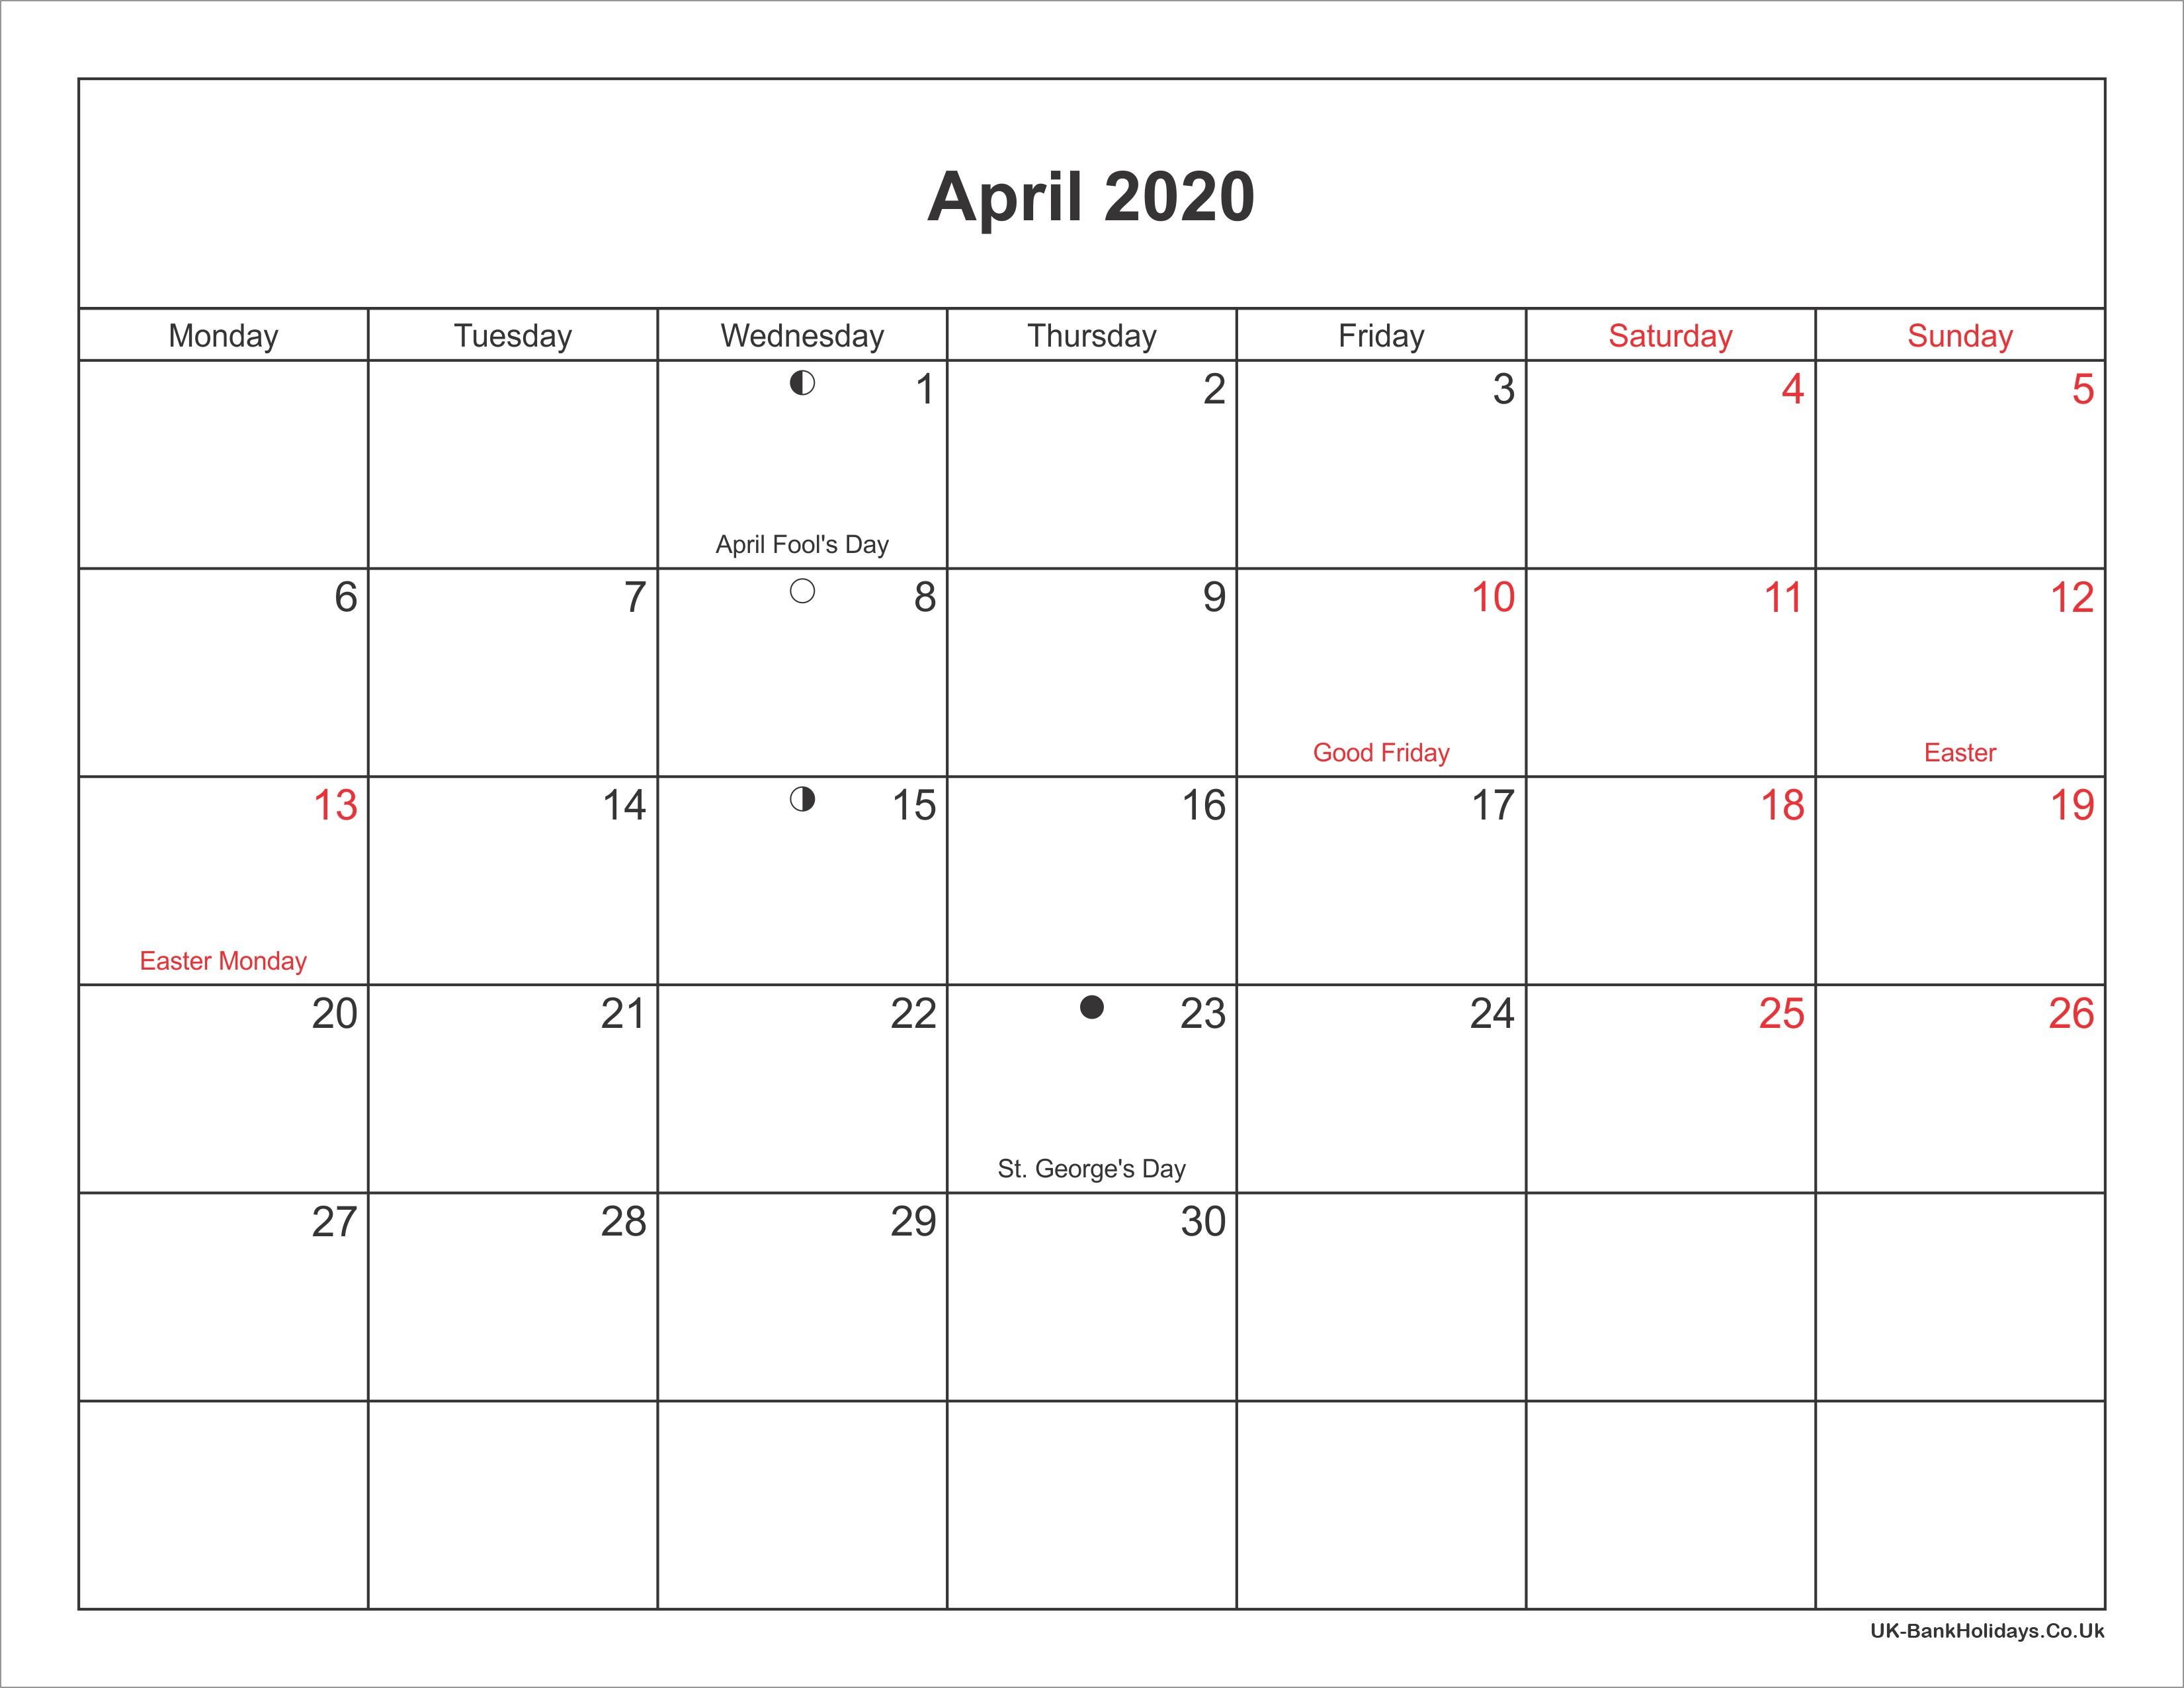 April 2020 Calendar Printable with Bank Holidays UK